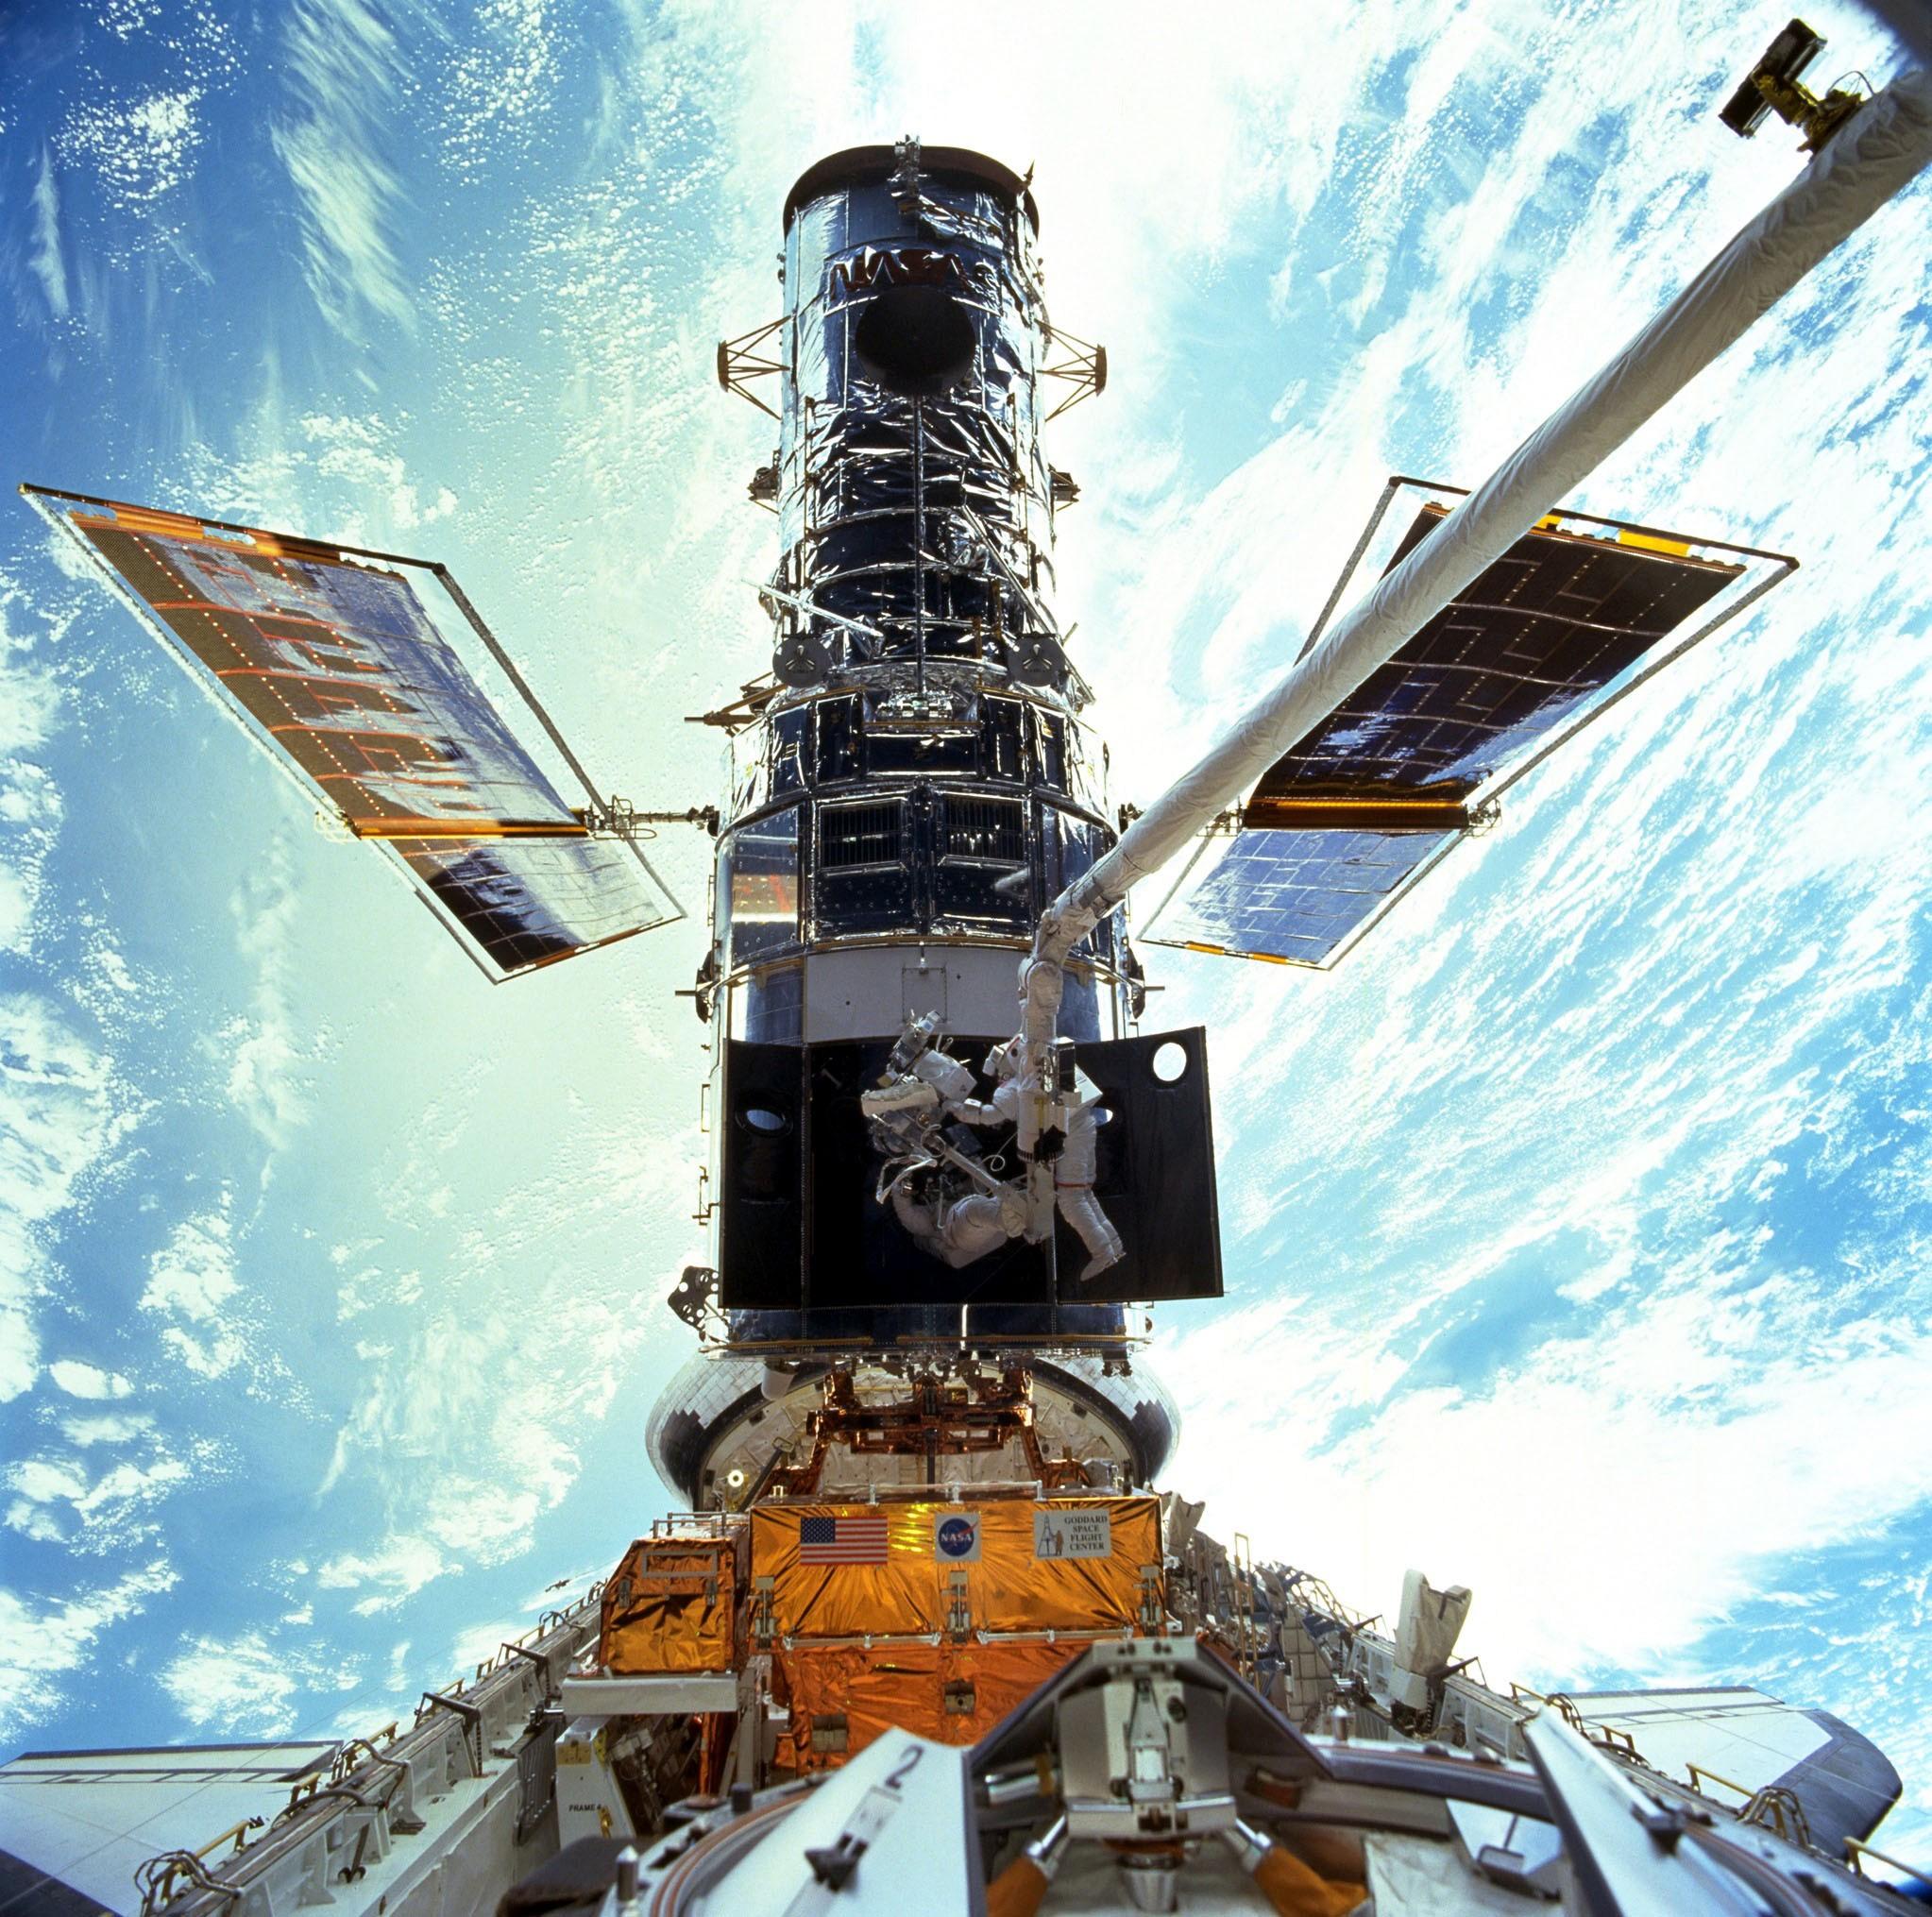 Steven Smith & John Grunsfeld servicing the Hubble Space Telescope